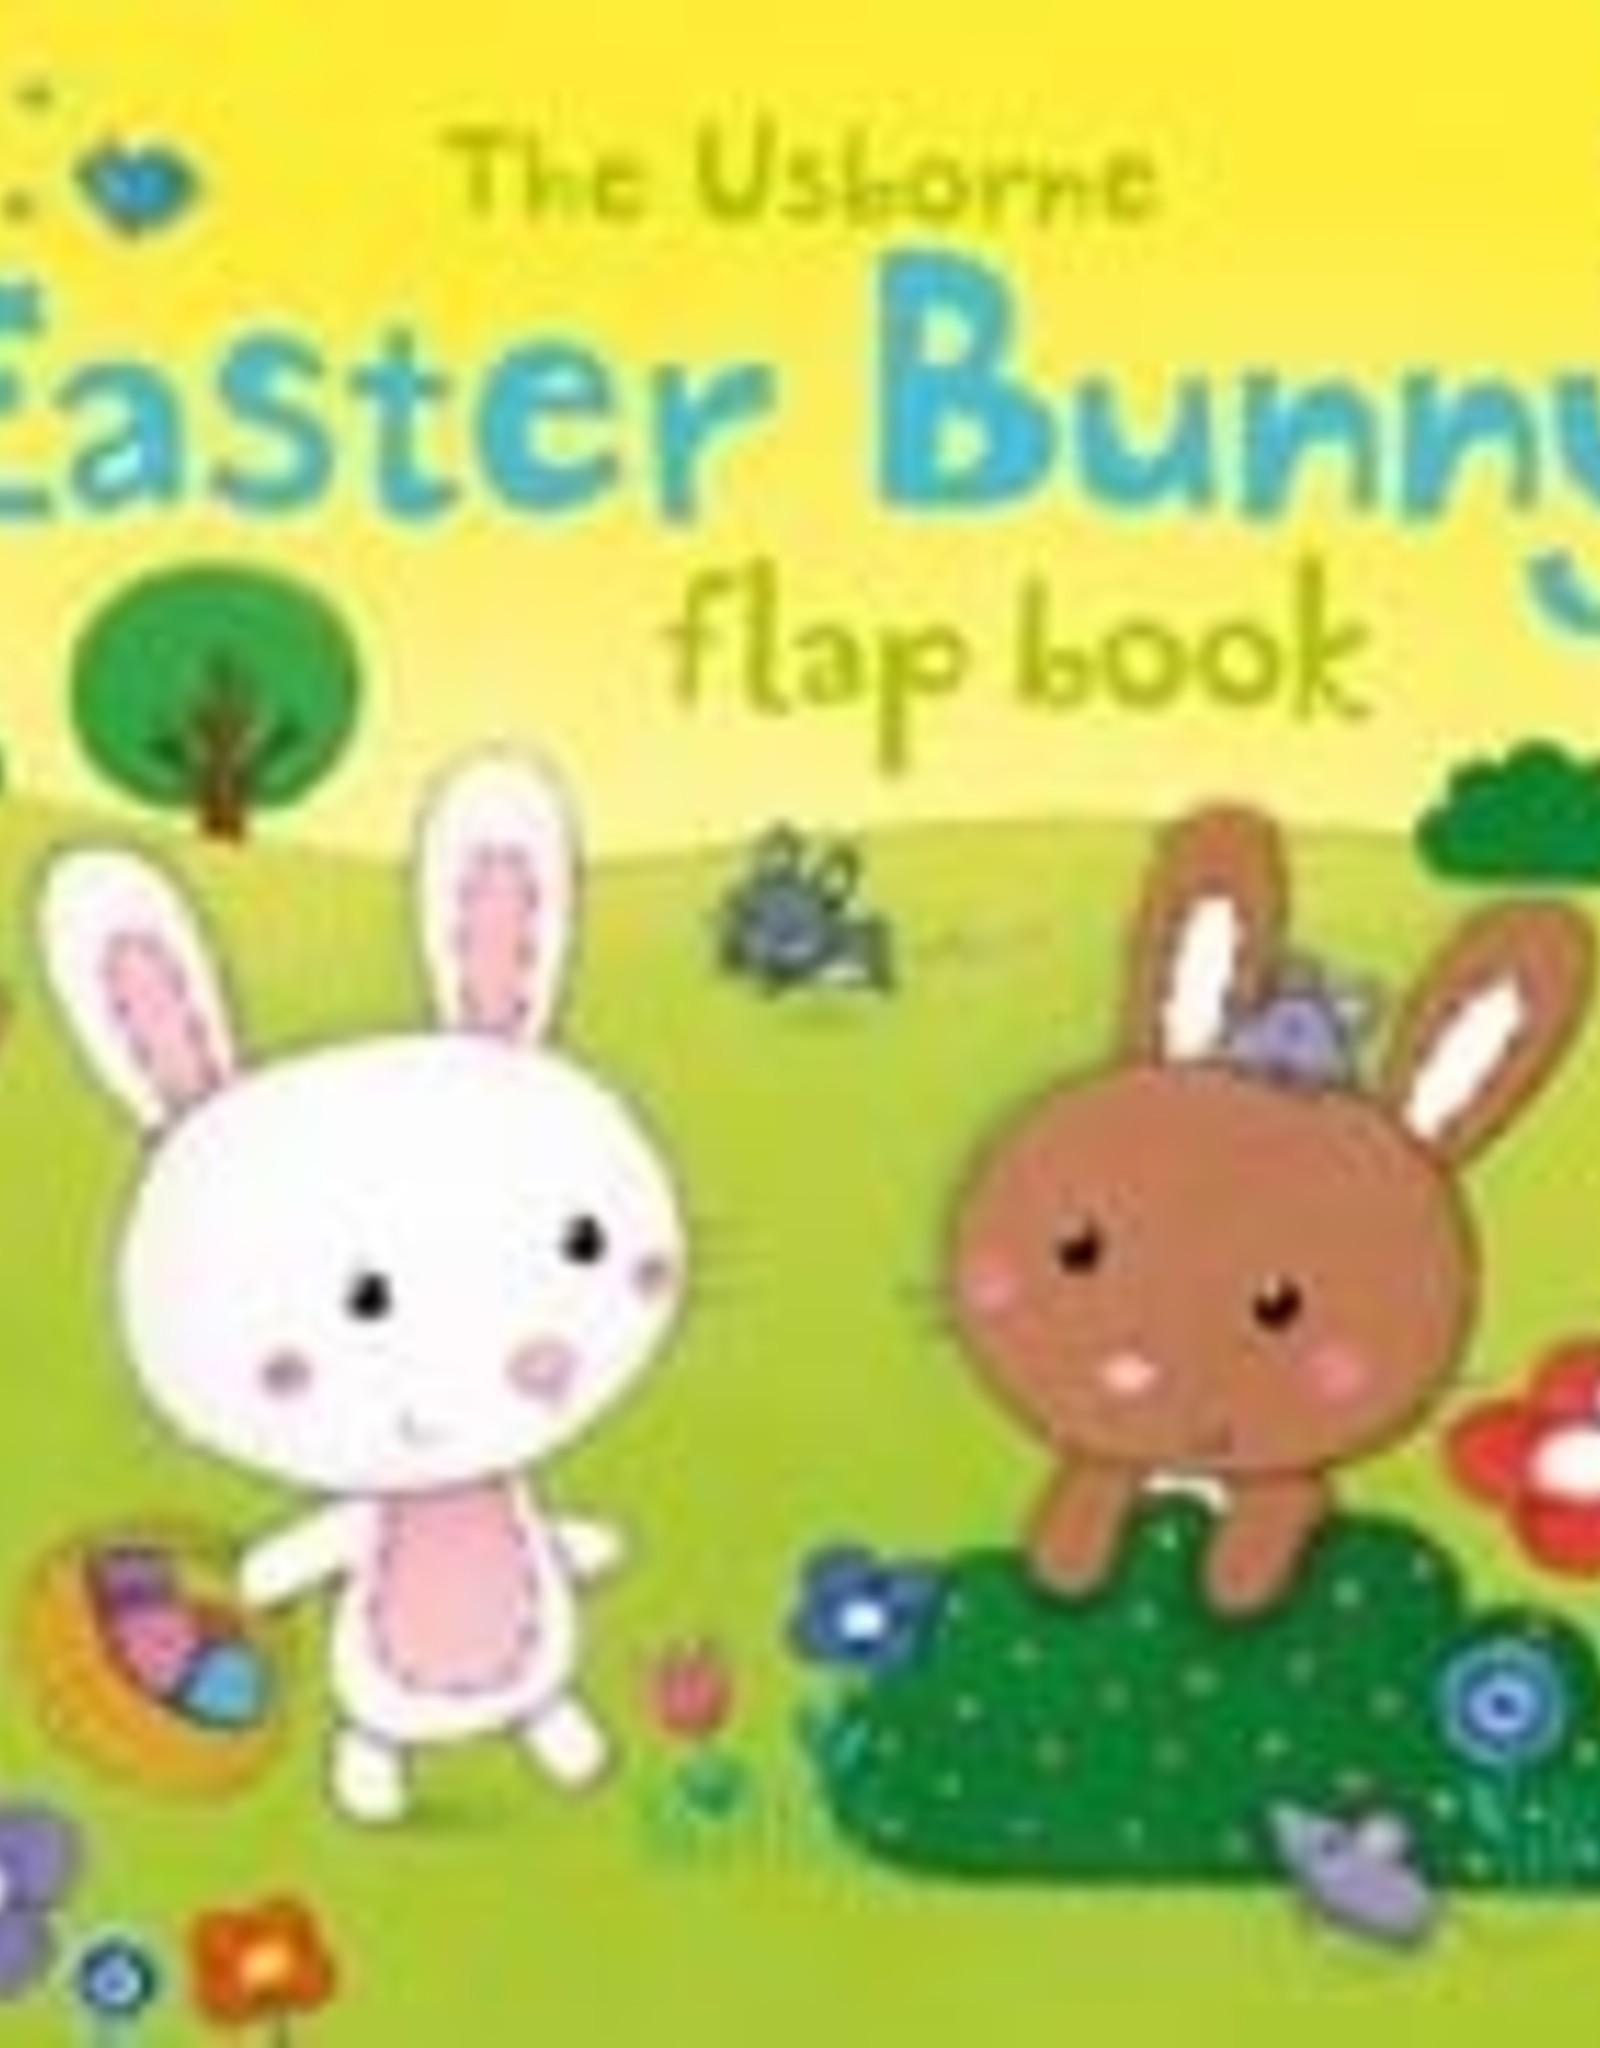 EDC Easter Bunny Flap Book